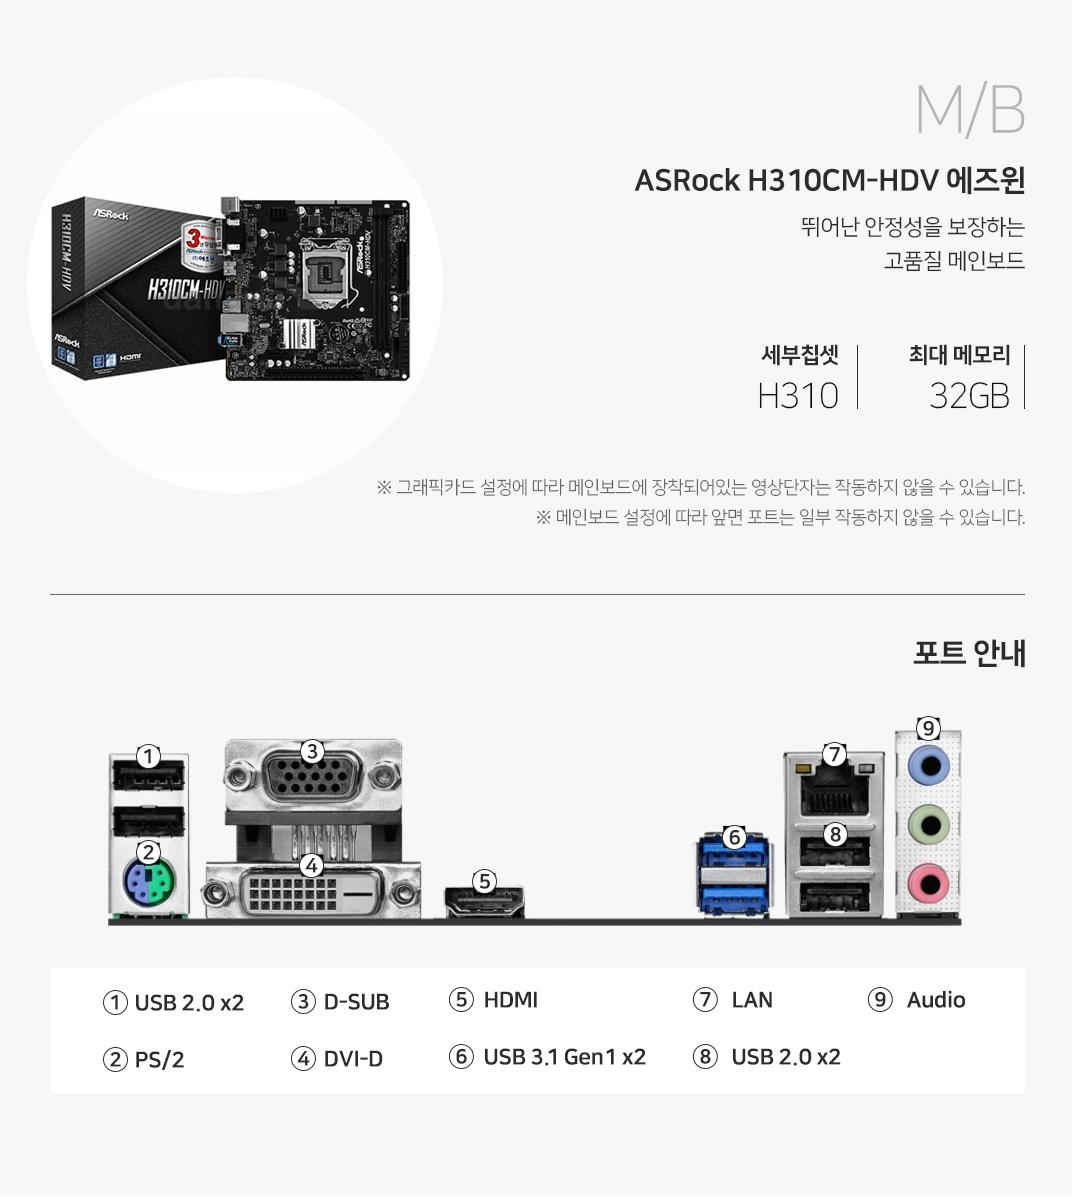 M/B ASRock H310CM-HDV 에즈윈 뛰어난 안정성을 보장하는 고품질 메인보드 세부칩셋 H310 최대 메모리 32GB 그래픽 설정에 따라 메인보드에 장착되어 있는 영상단자는 작동하지 않을 수 있습니다. 메인보드 설정에 따라 앞면 포트는 일부 작동하지 않을 수 있습니다.